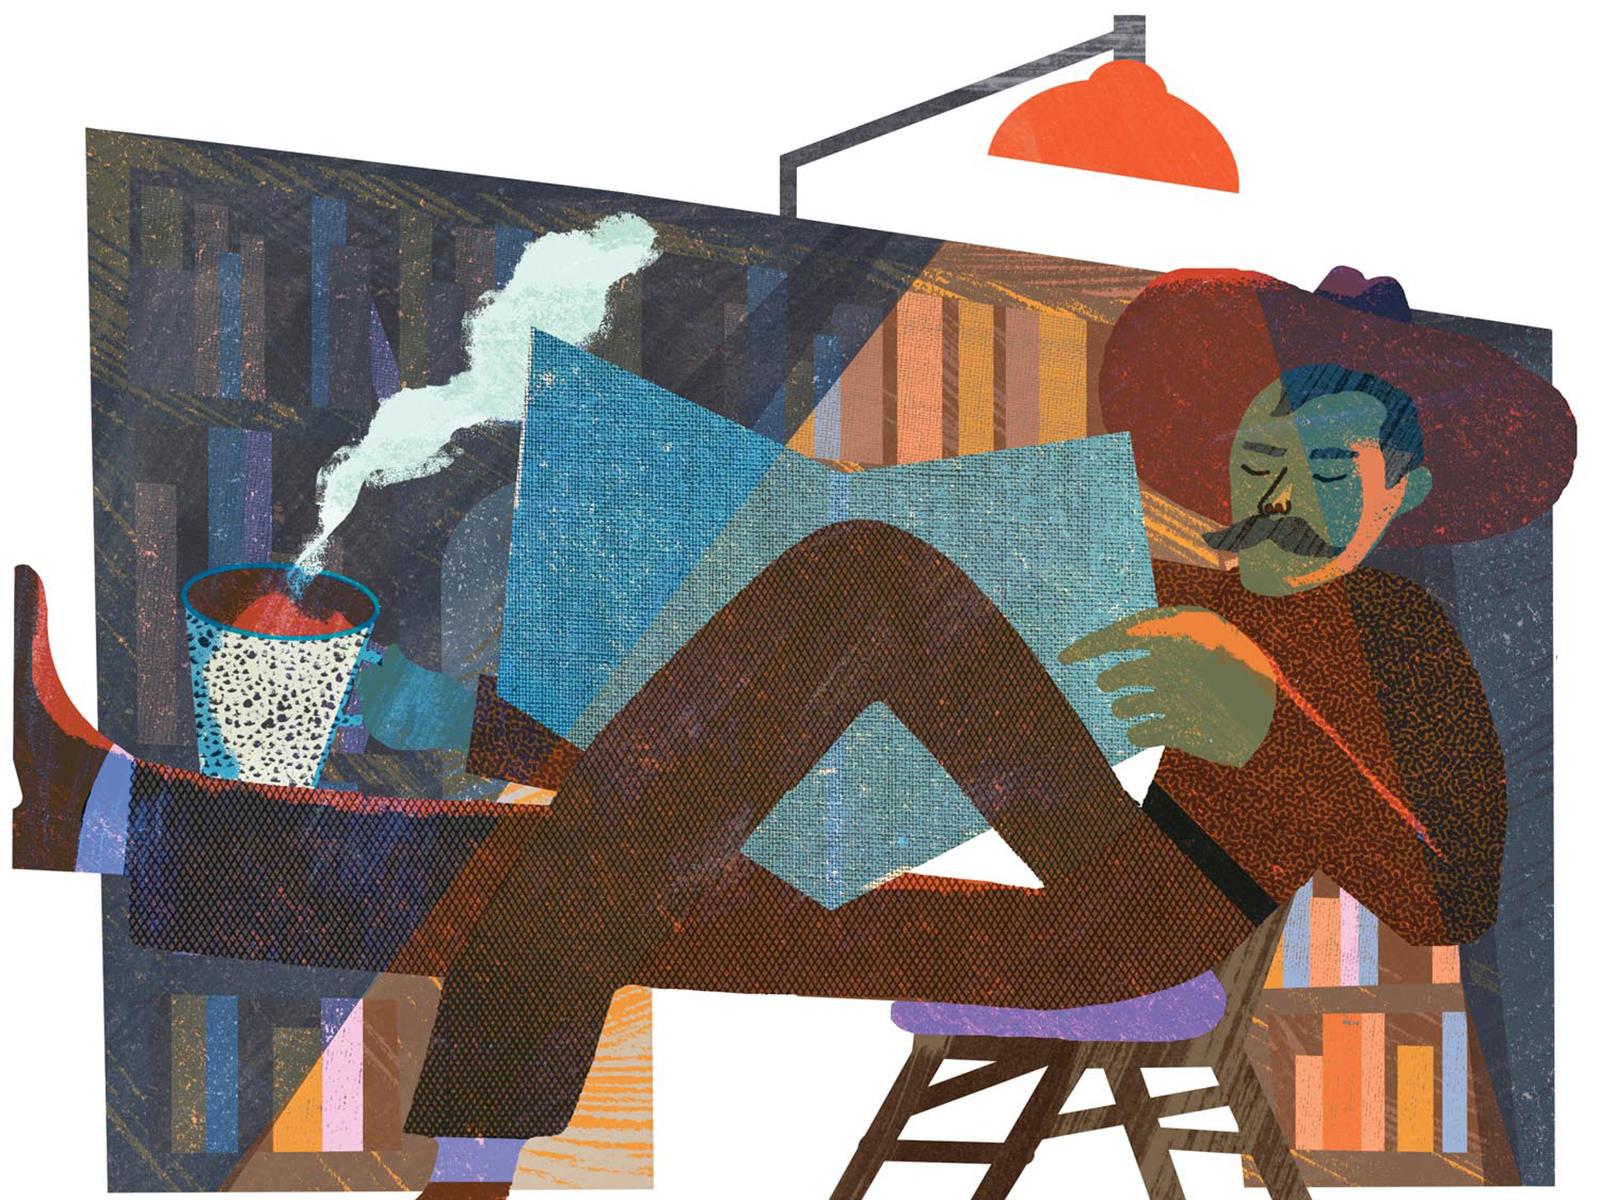 Nicholas Stevenson Illustrations